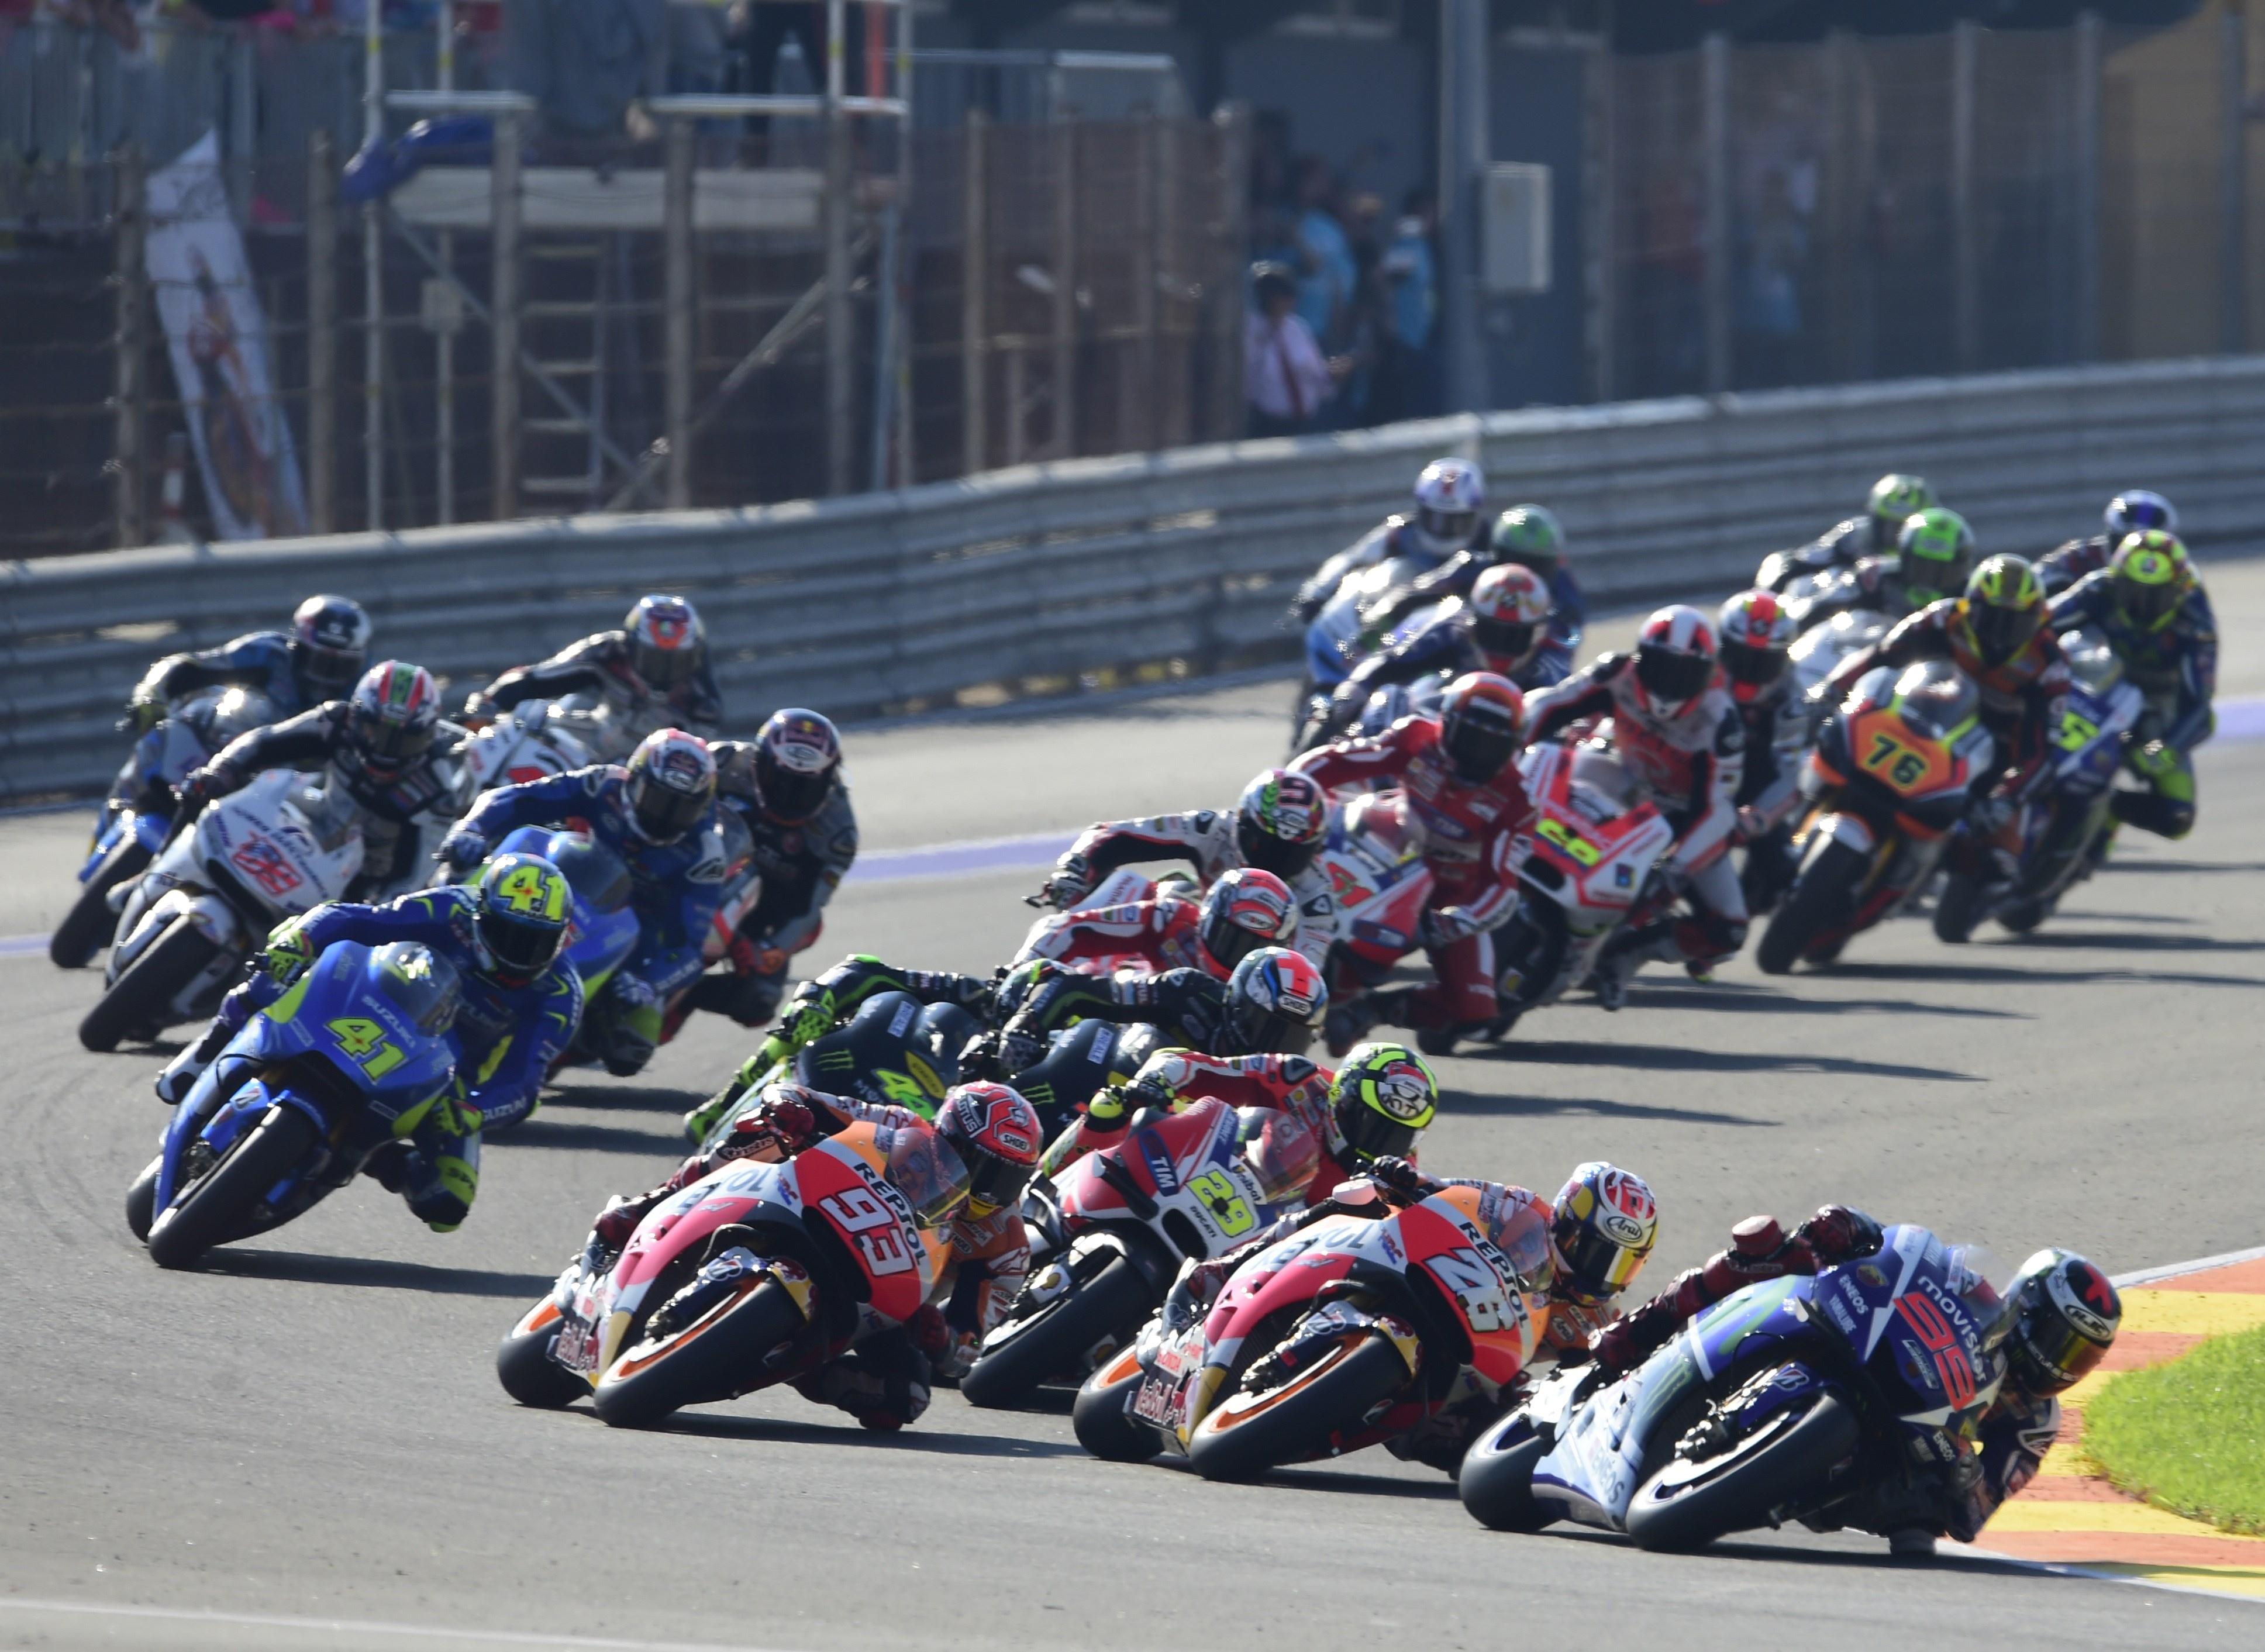 MotoGP 2015: Valencia race results